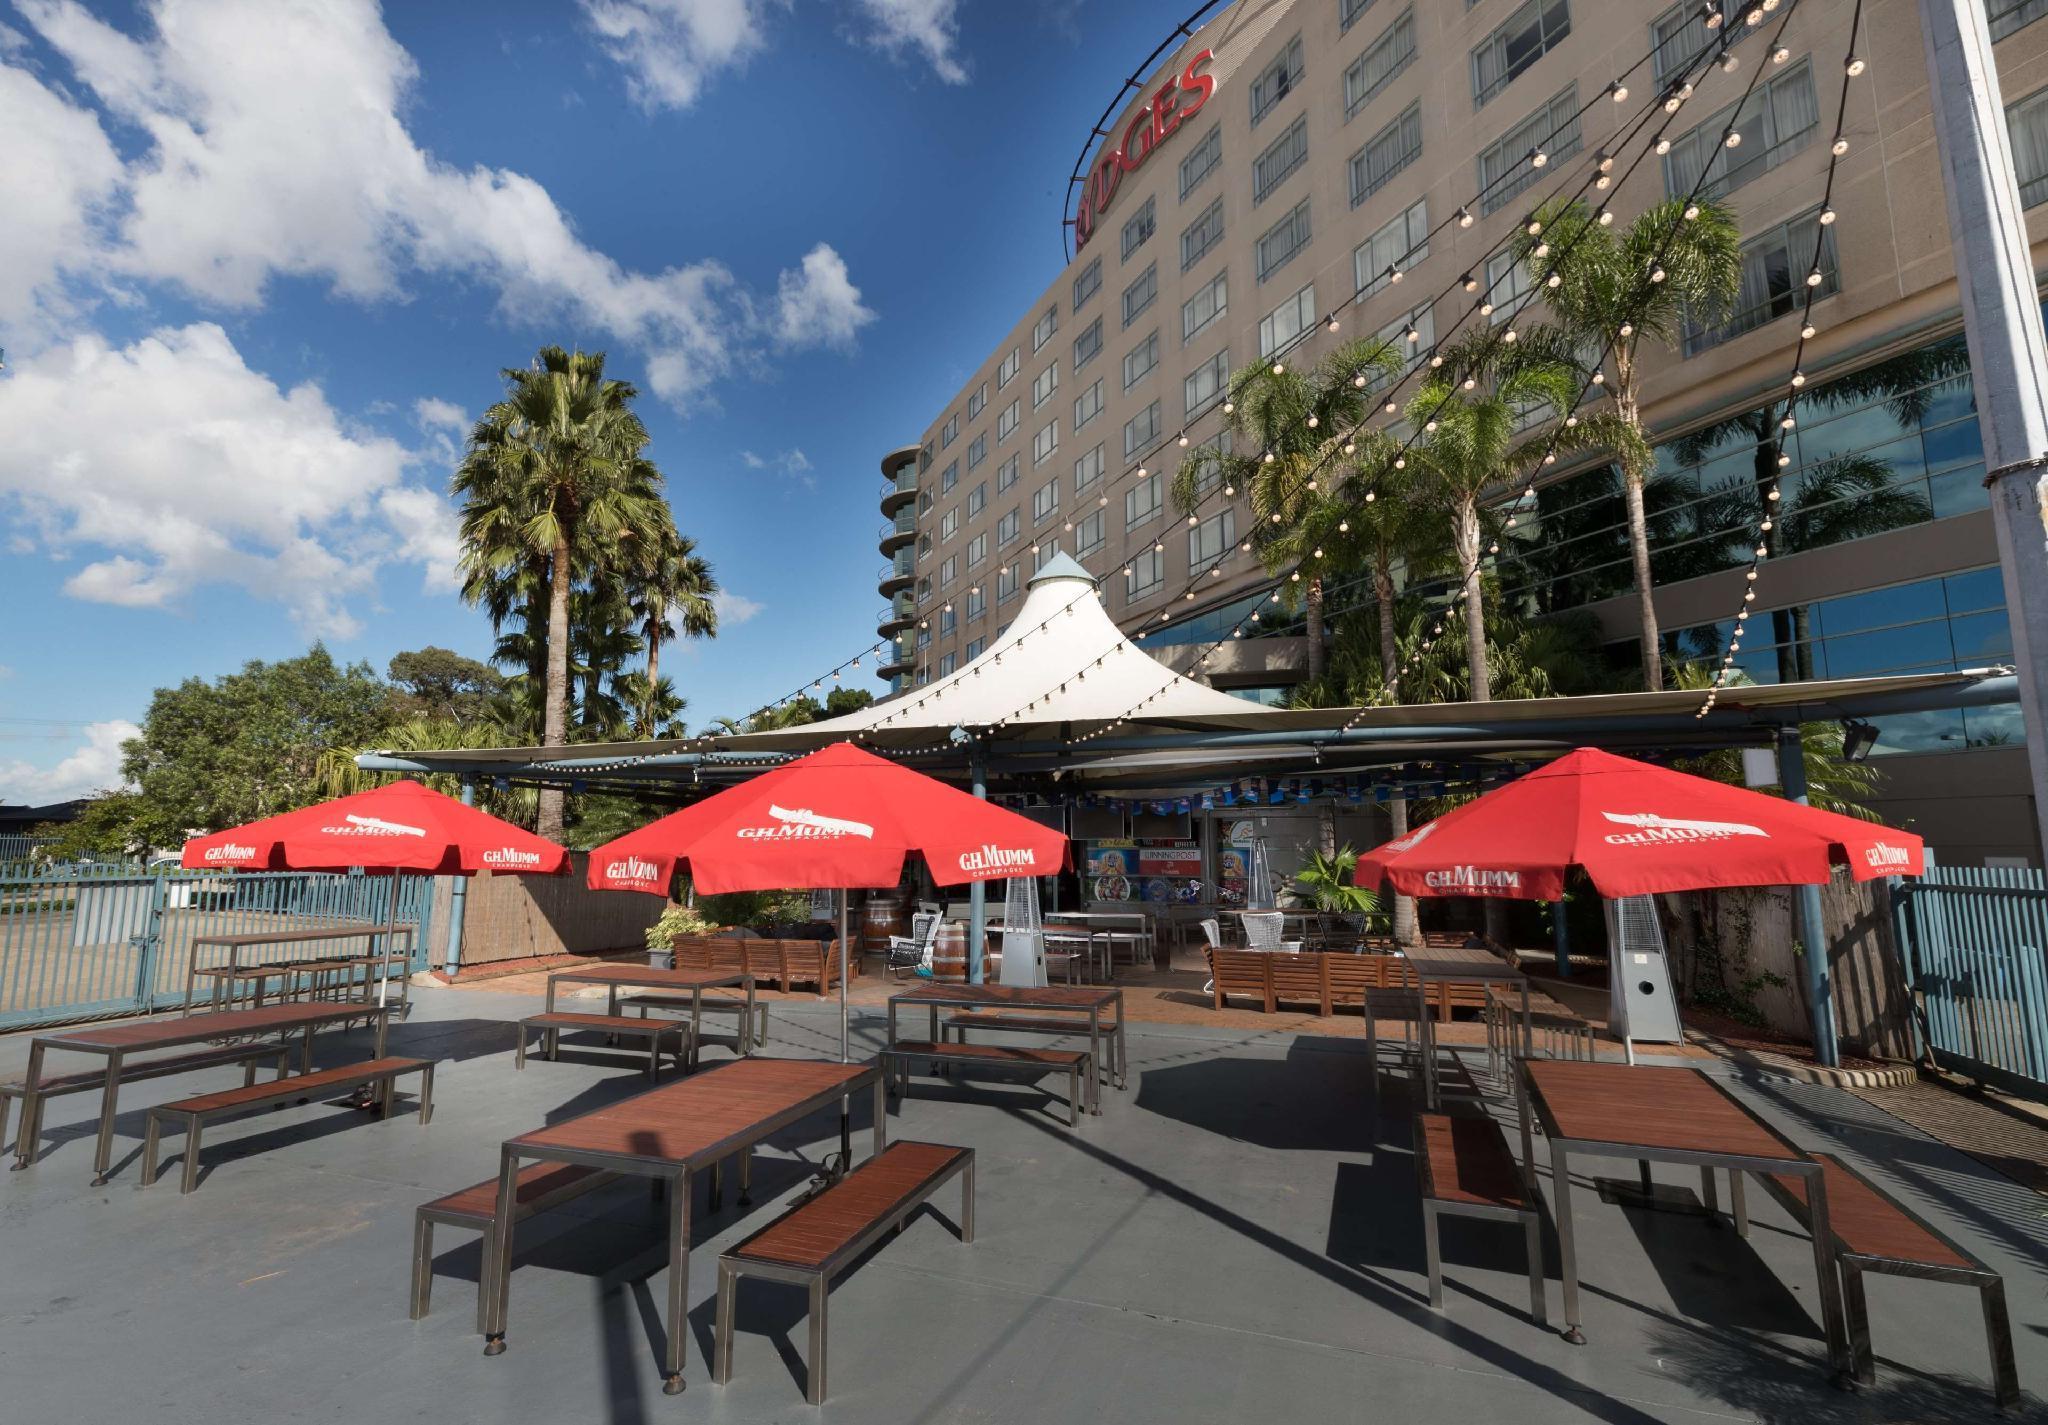 Rydges Parramatta Hotel